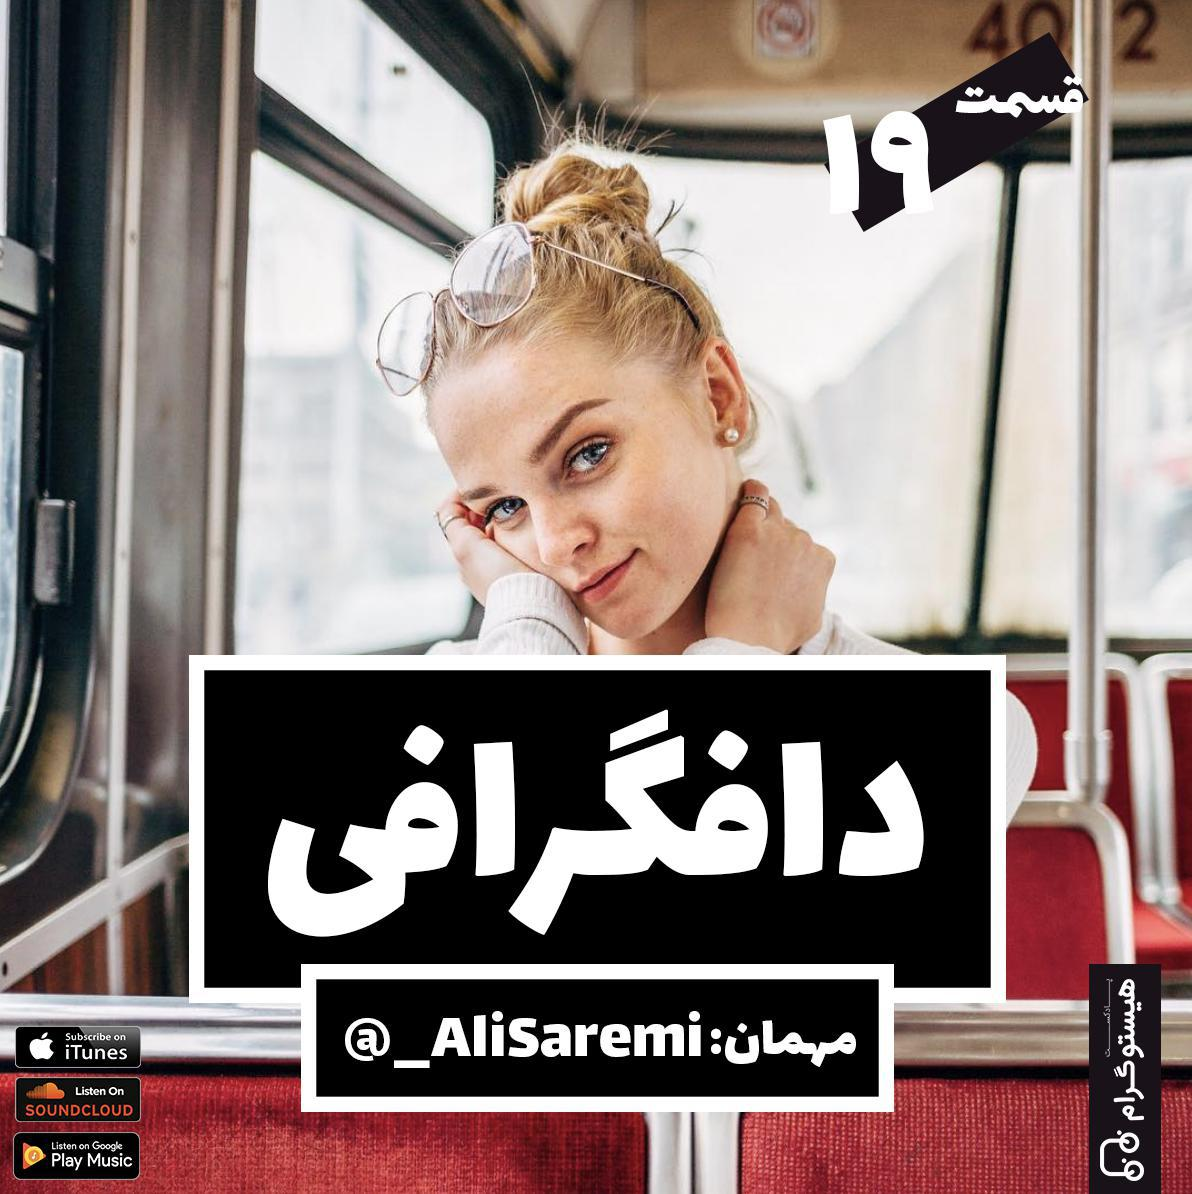 Ali Saremi with Histogram Podcast